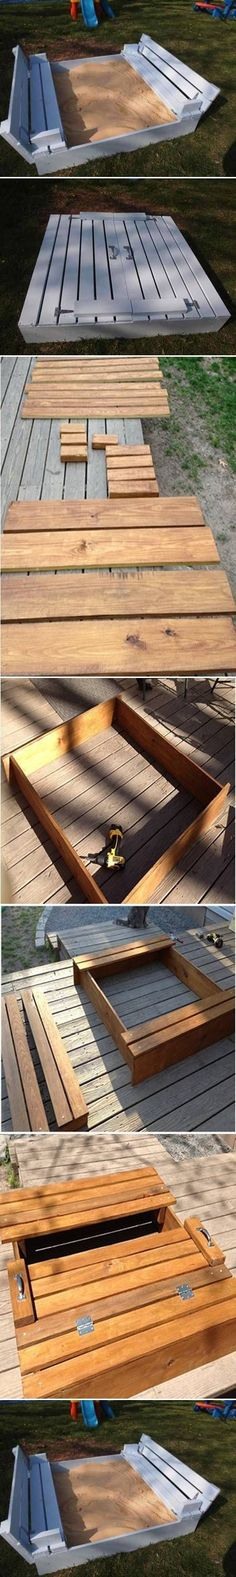 How to make a sandbox for kids